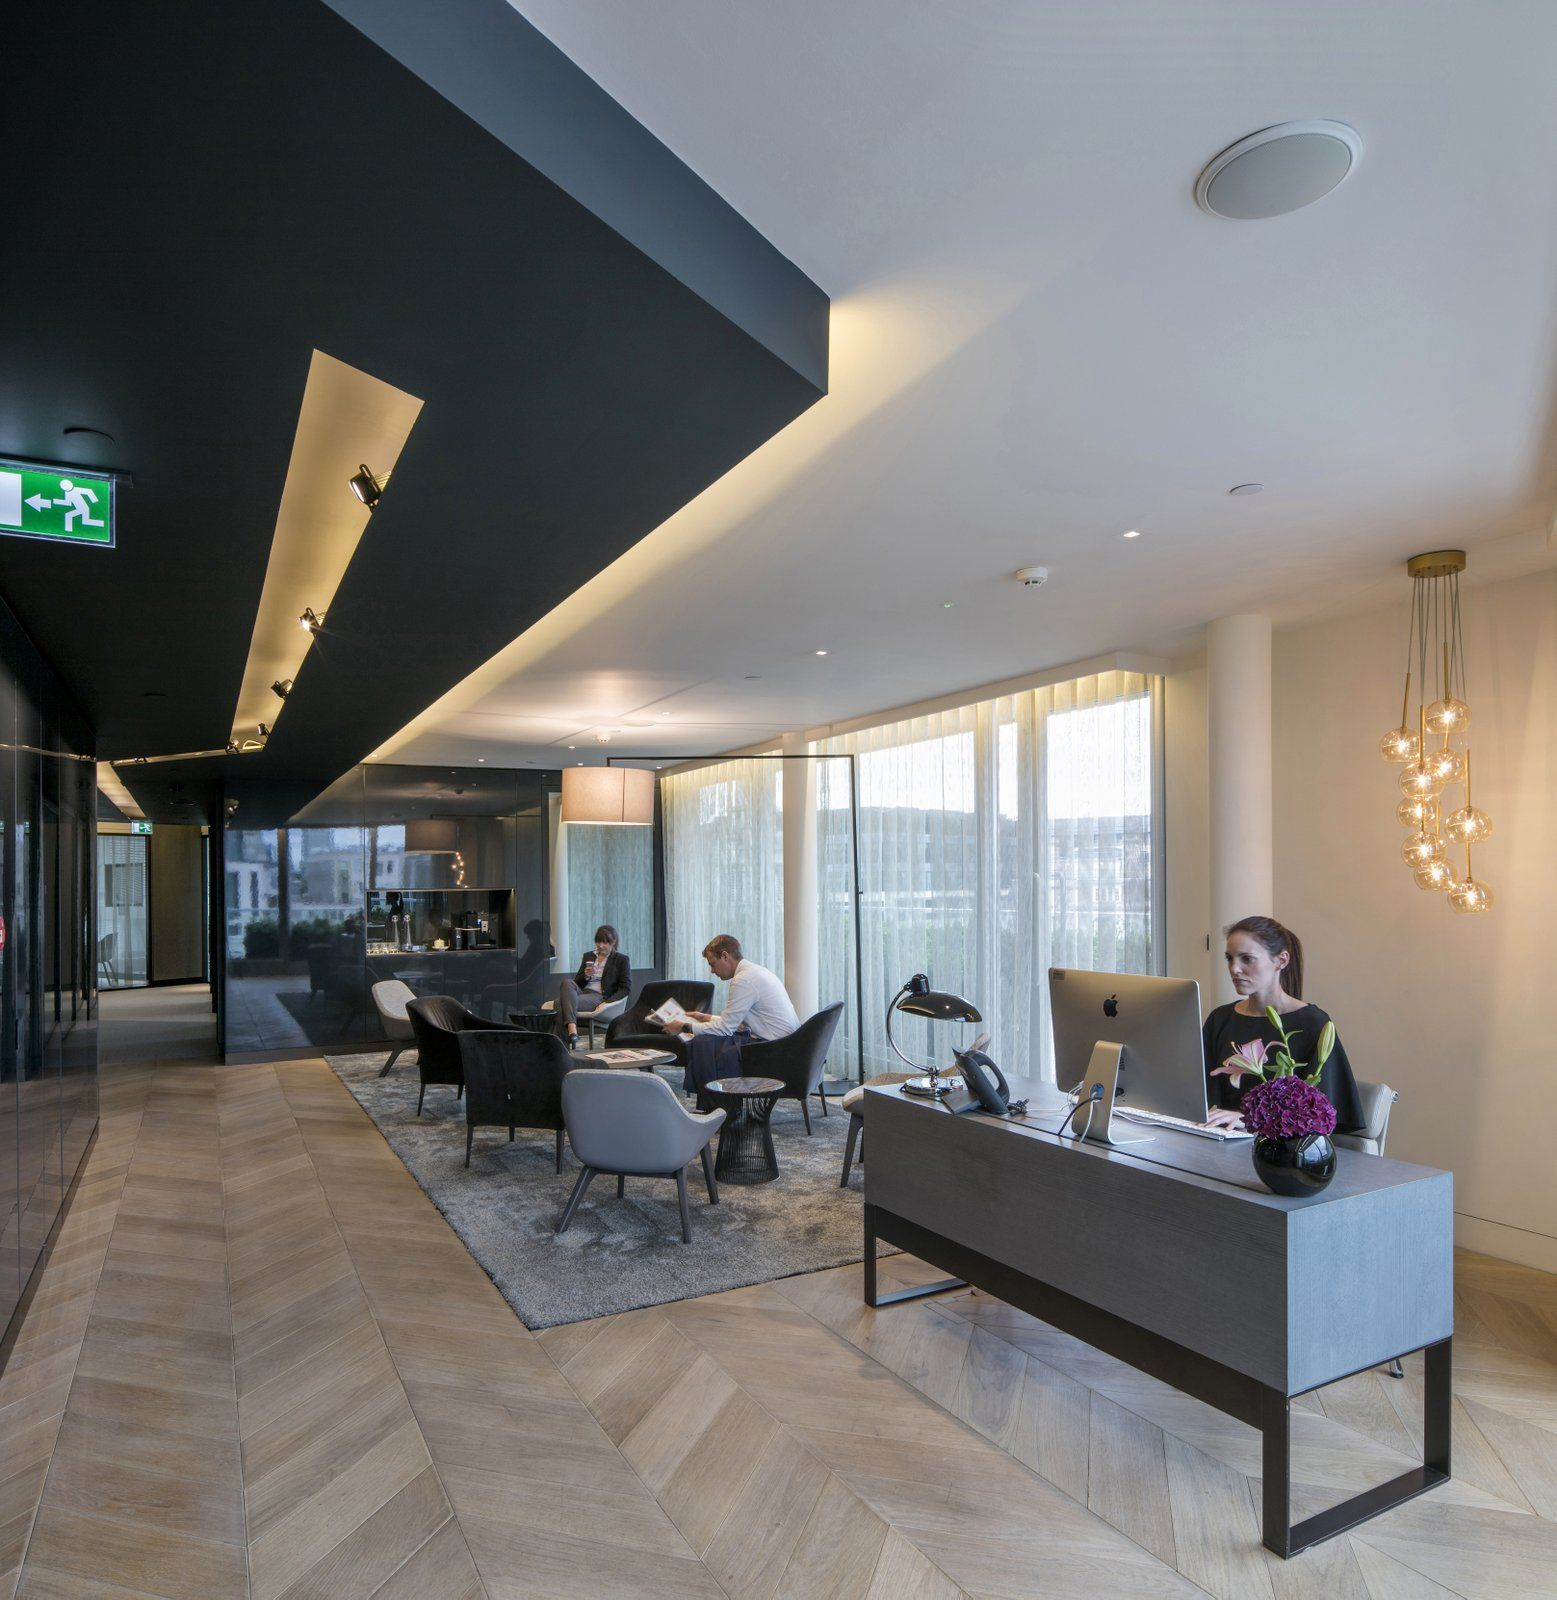 CBRE Offices U2013 London. Reception. Herringbone Wood Floor